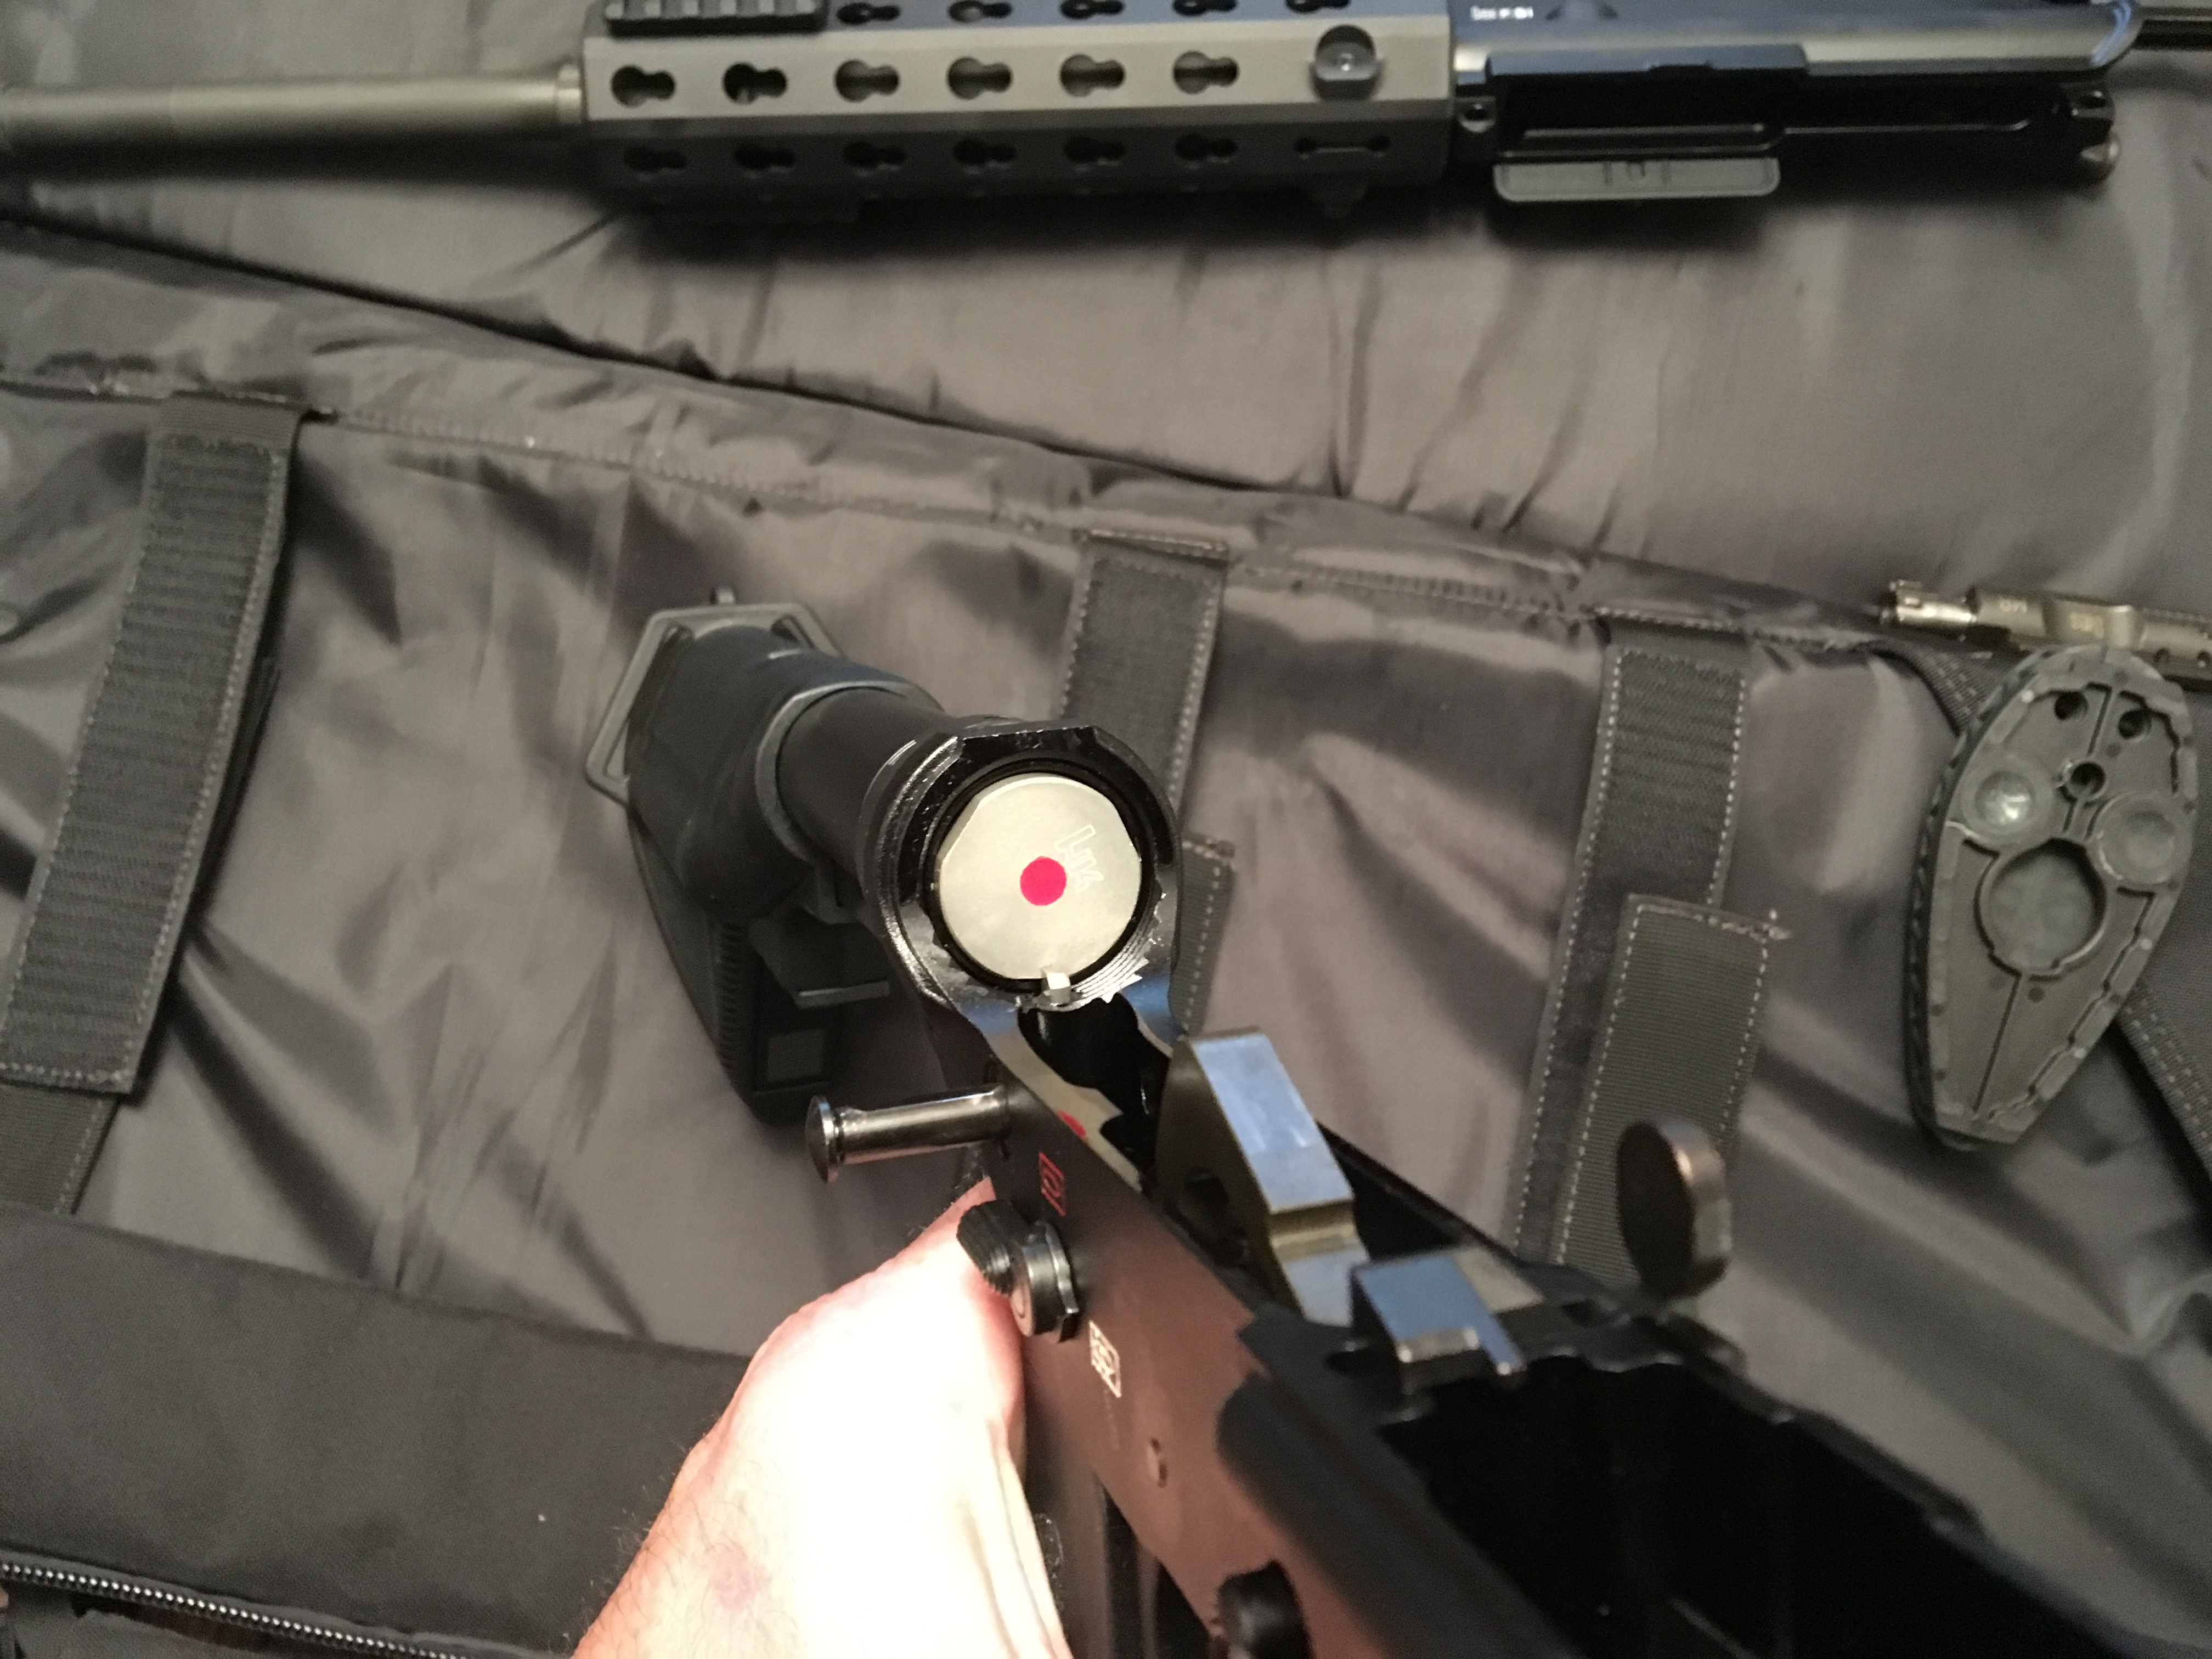 WTS: Hk MR556A1 like new w/HK bag/ lower price-1de41661-b65a-4ecd-9df8-89ac35e3e74e.jpeg